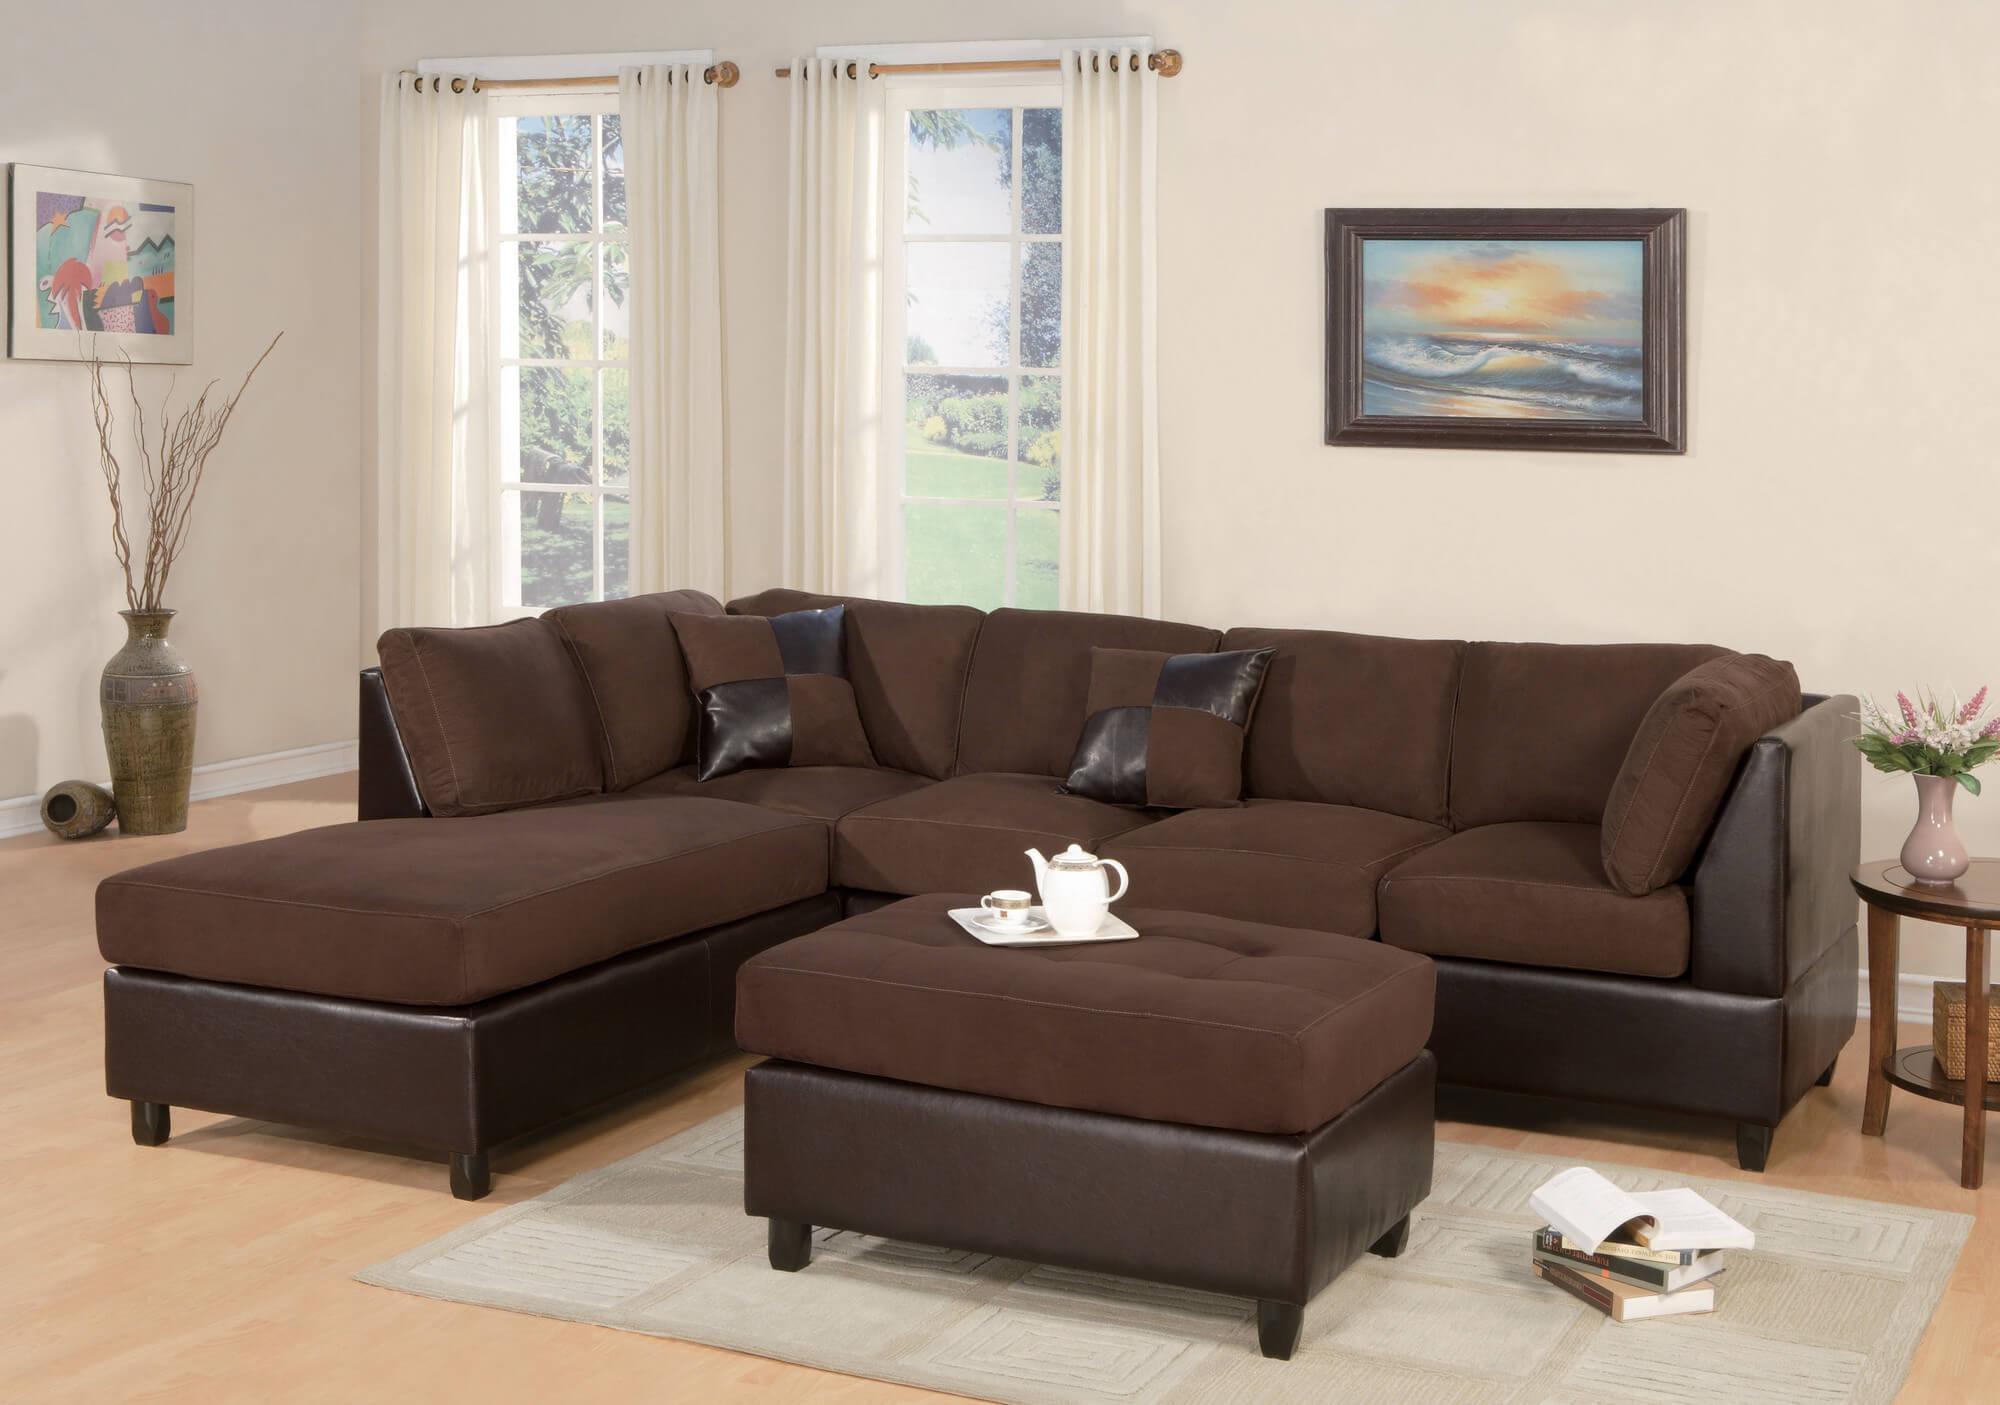 Sofas Center : Unusual Big Lots Sofa Images Design Couch Sleeper Regarding Big Lots Sofas (Image 18 of 20)